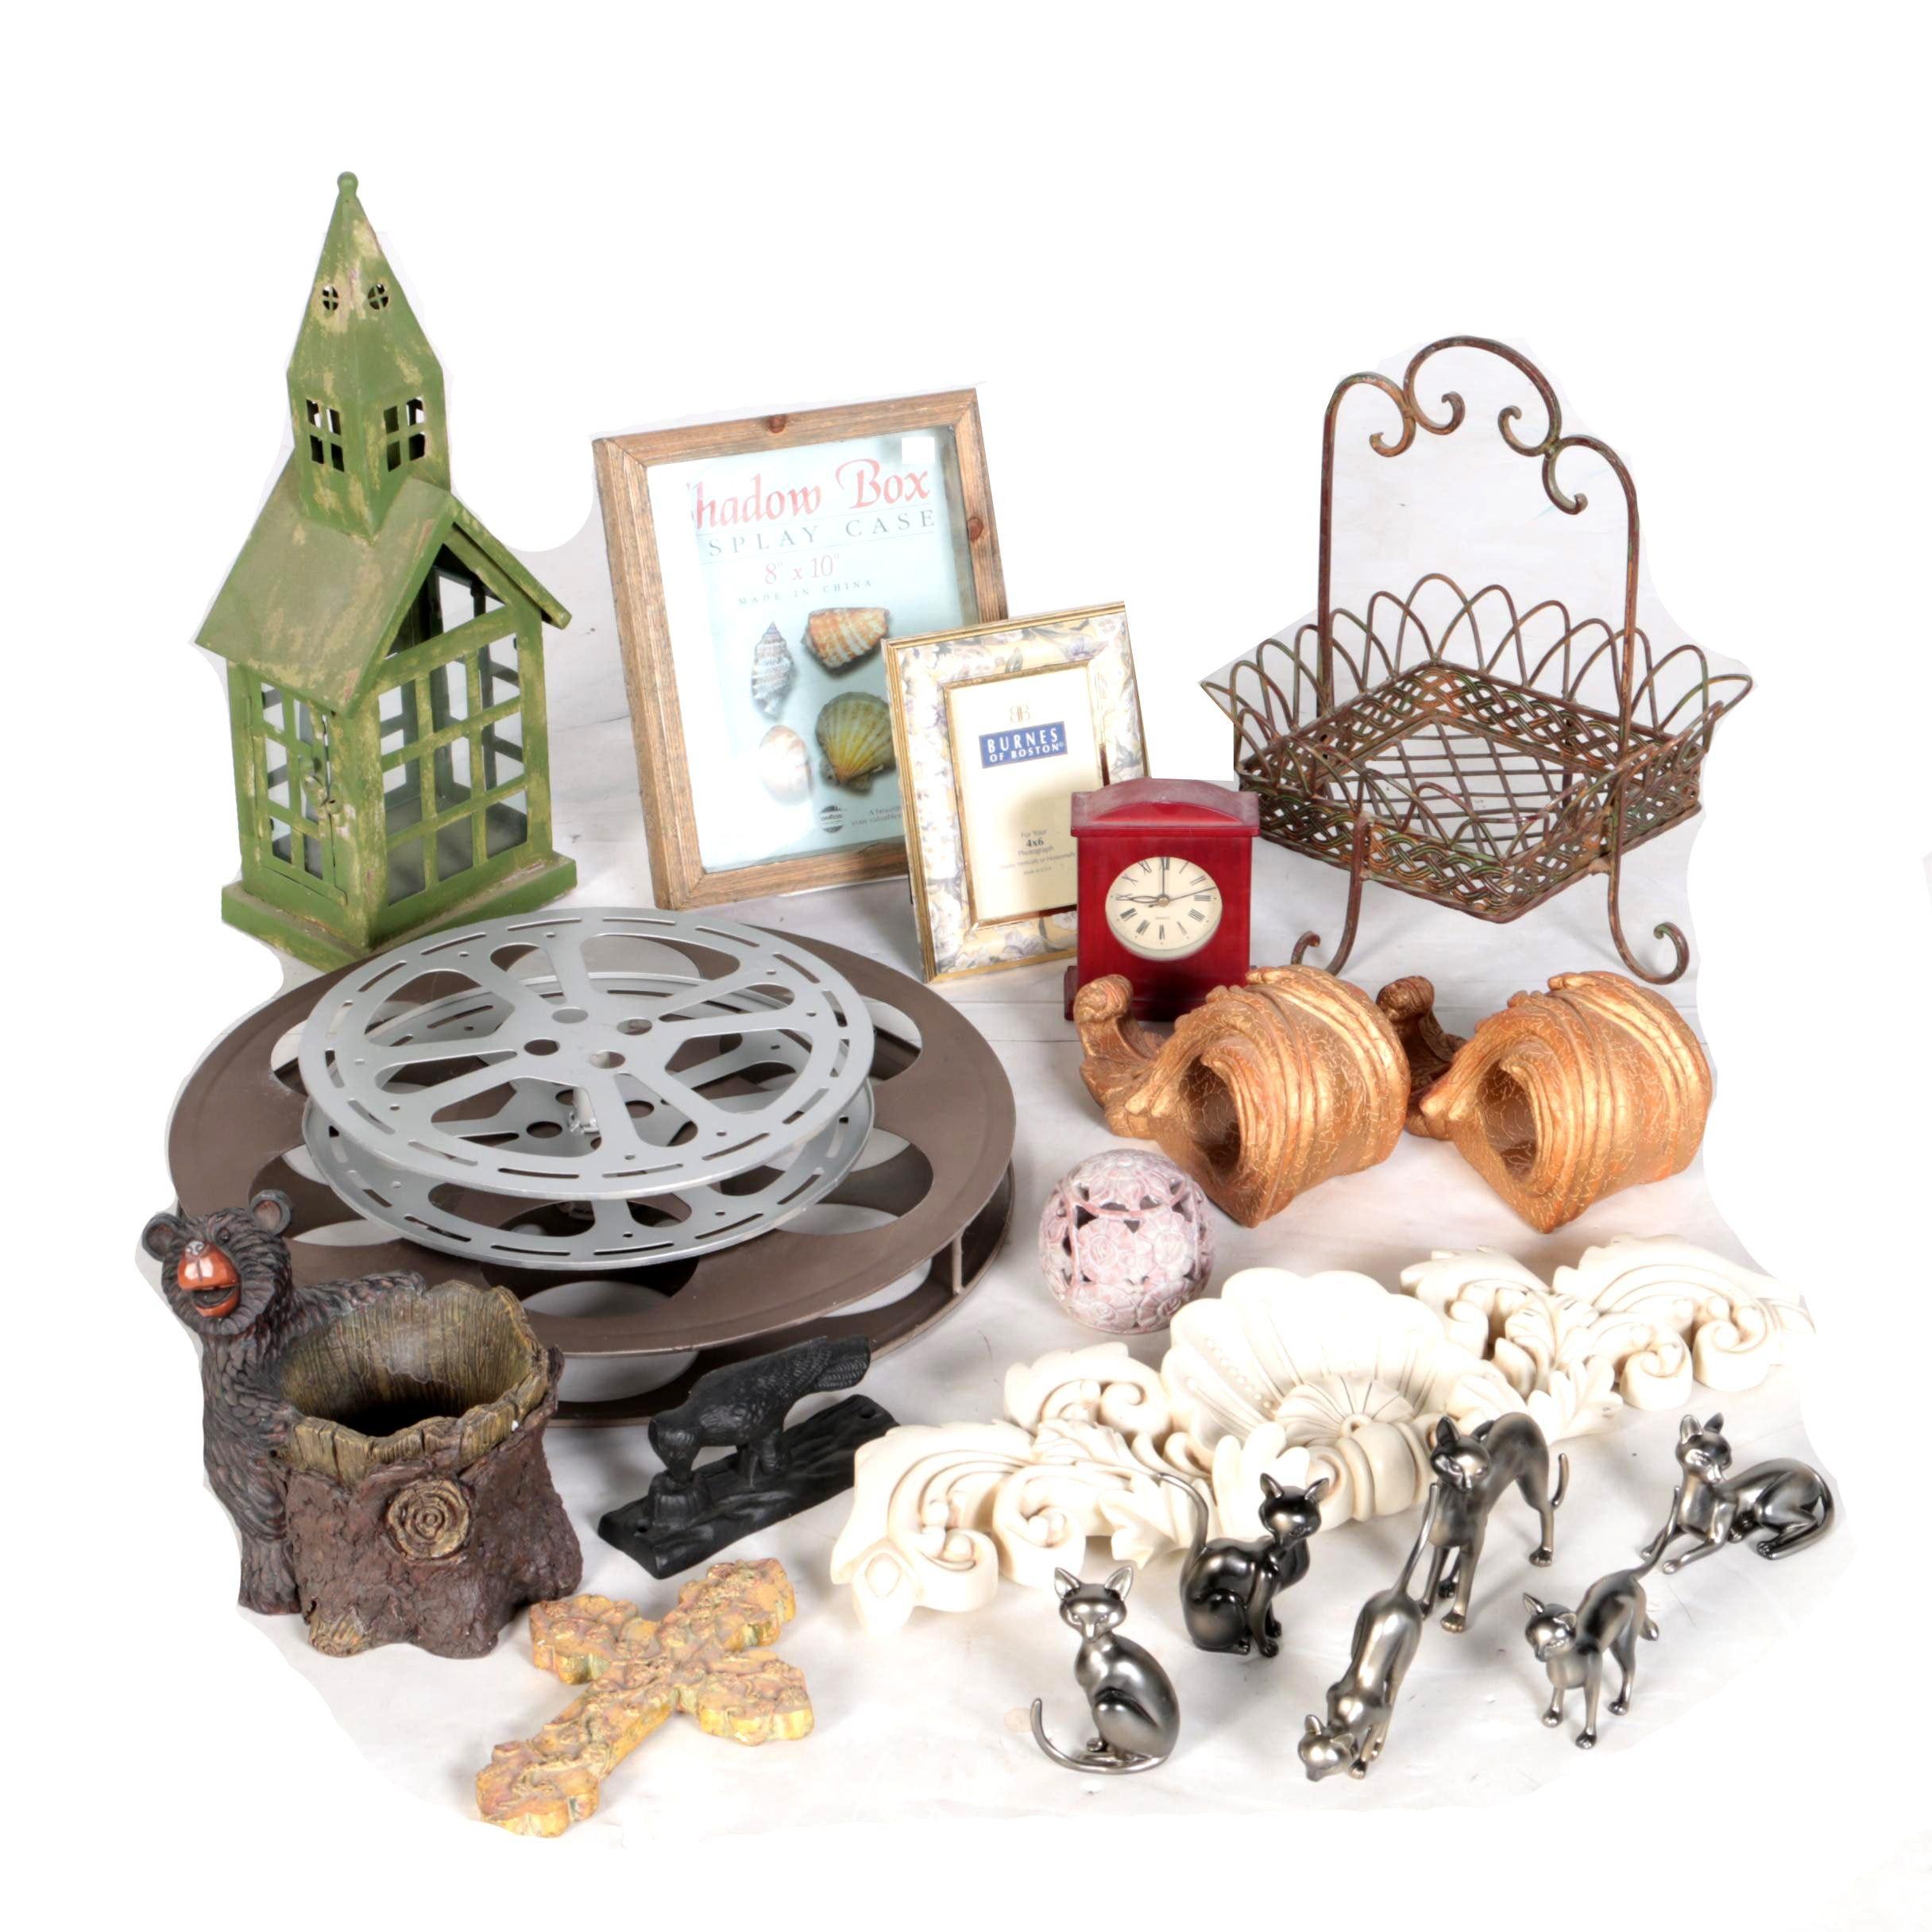 Assortment of Home Decor Items Including Siamese Cat Figurines